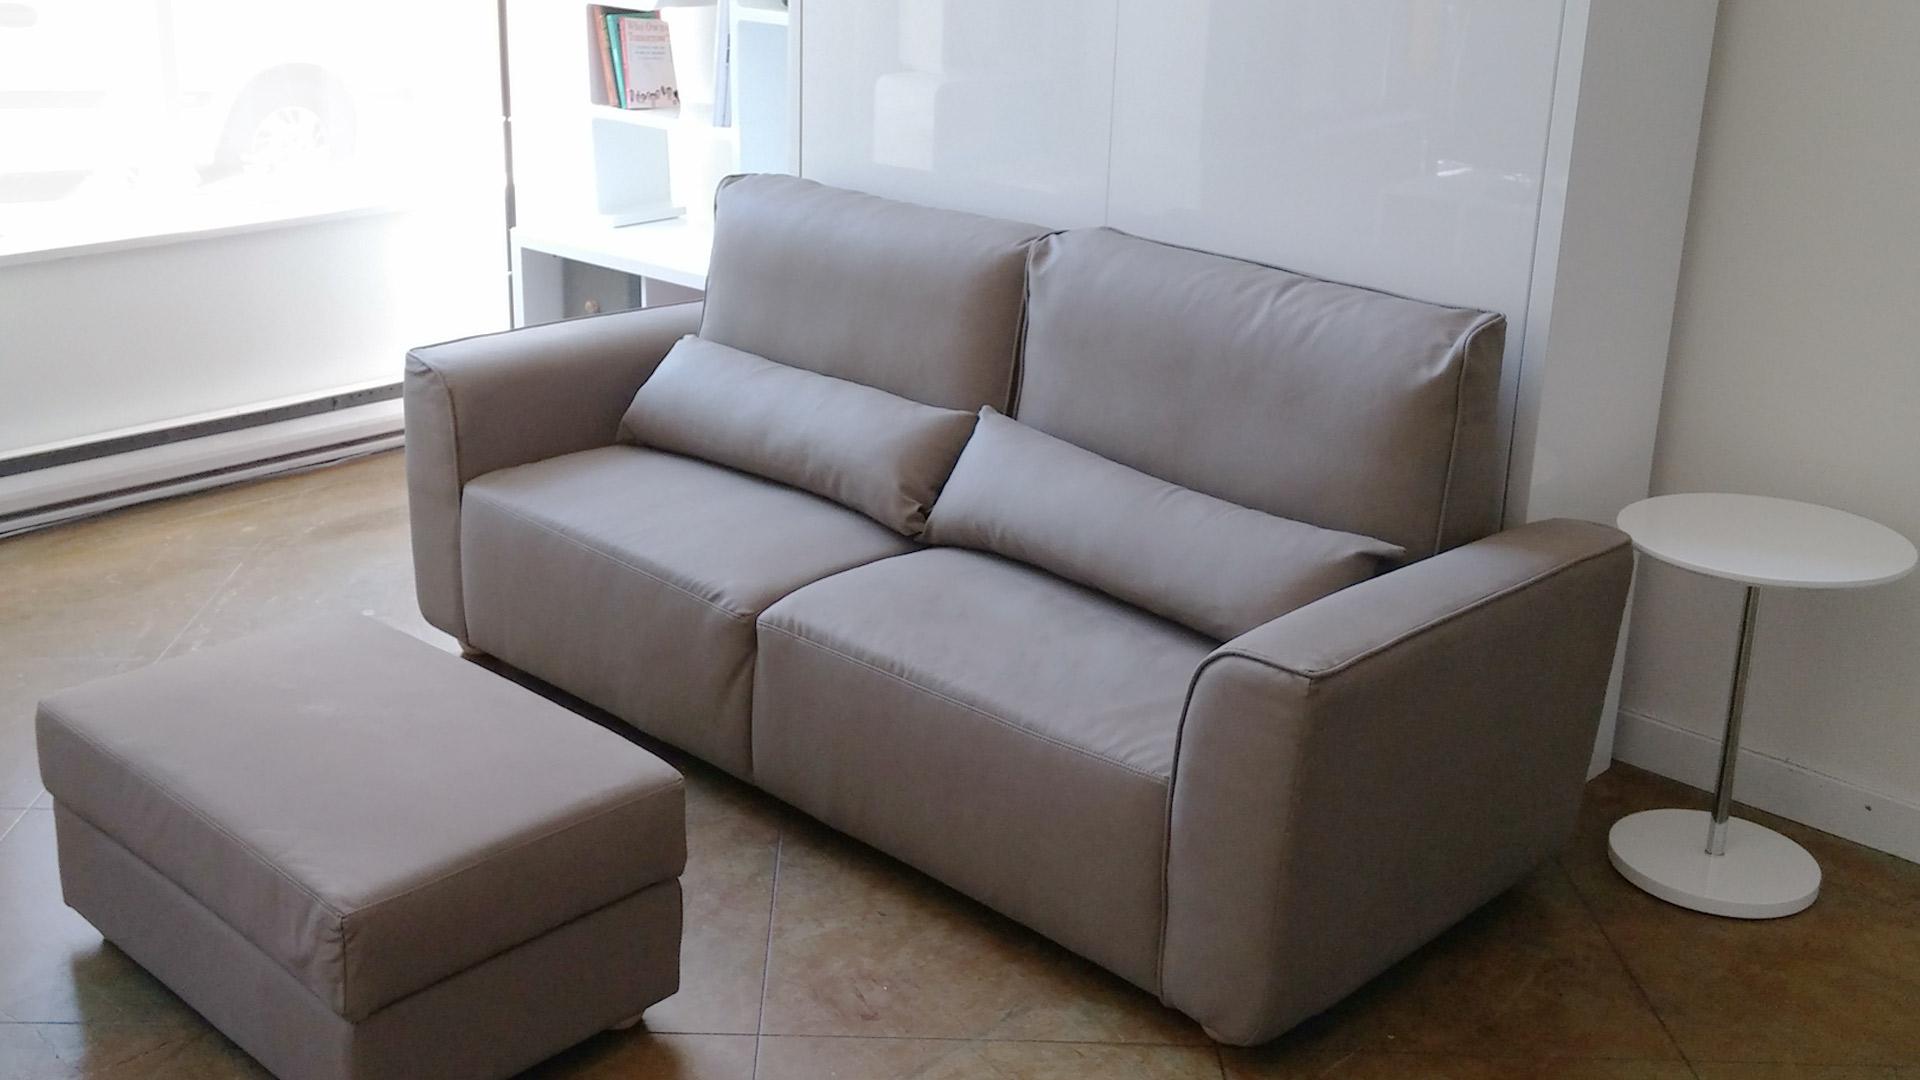 Murphysofa Minima Expand Furniture Folding Tables Smarter Wall